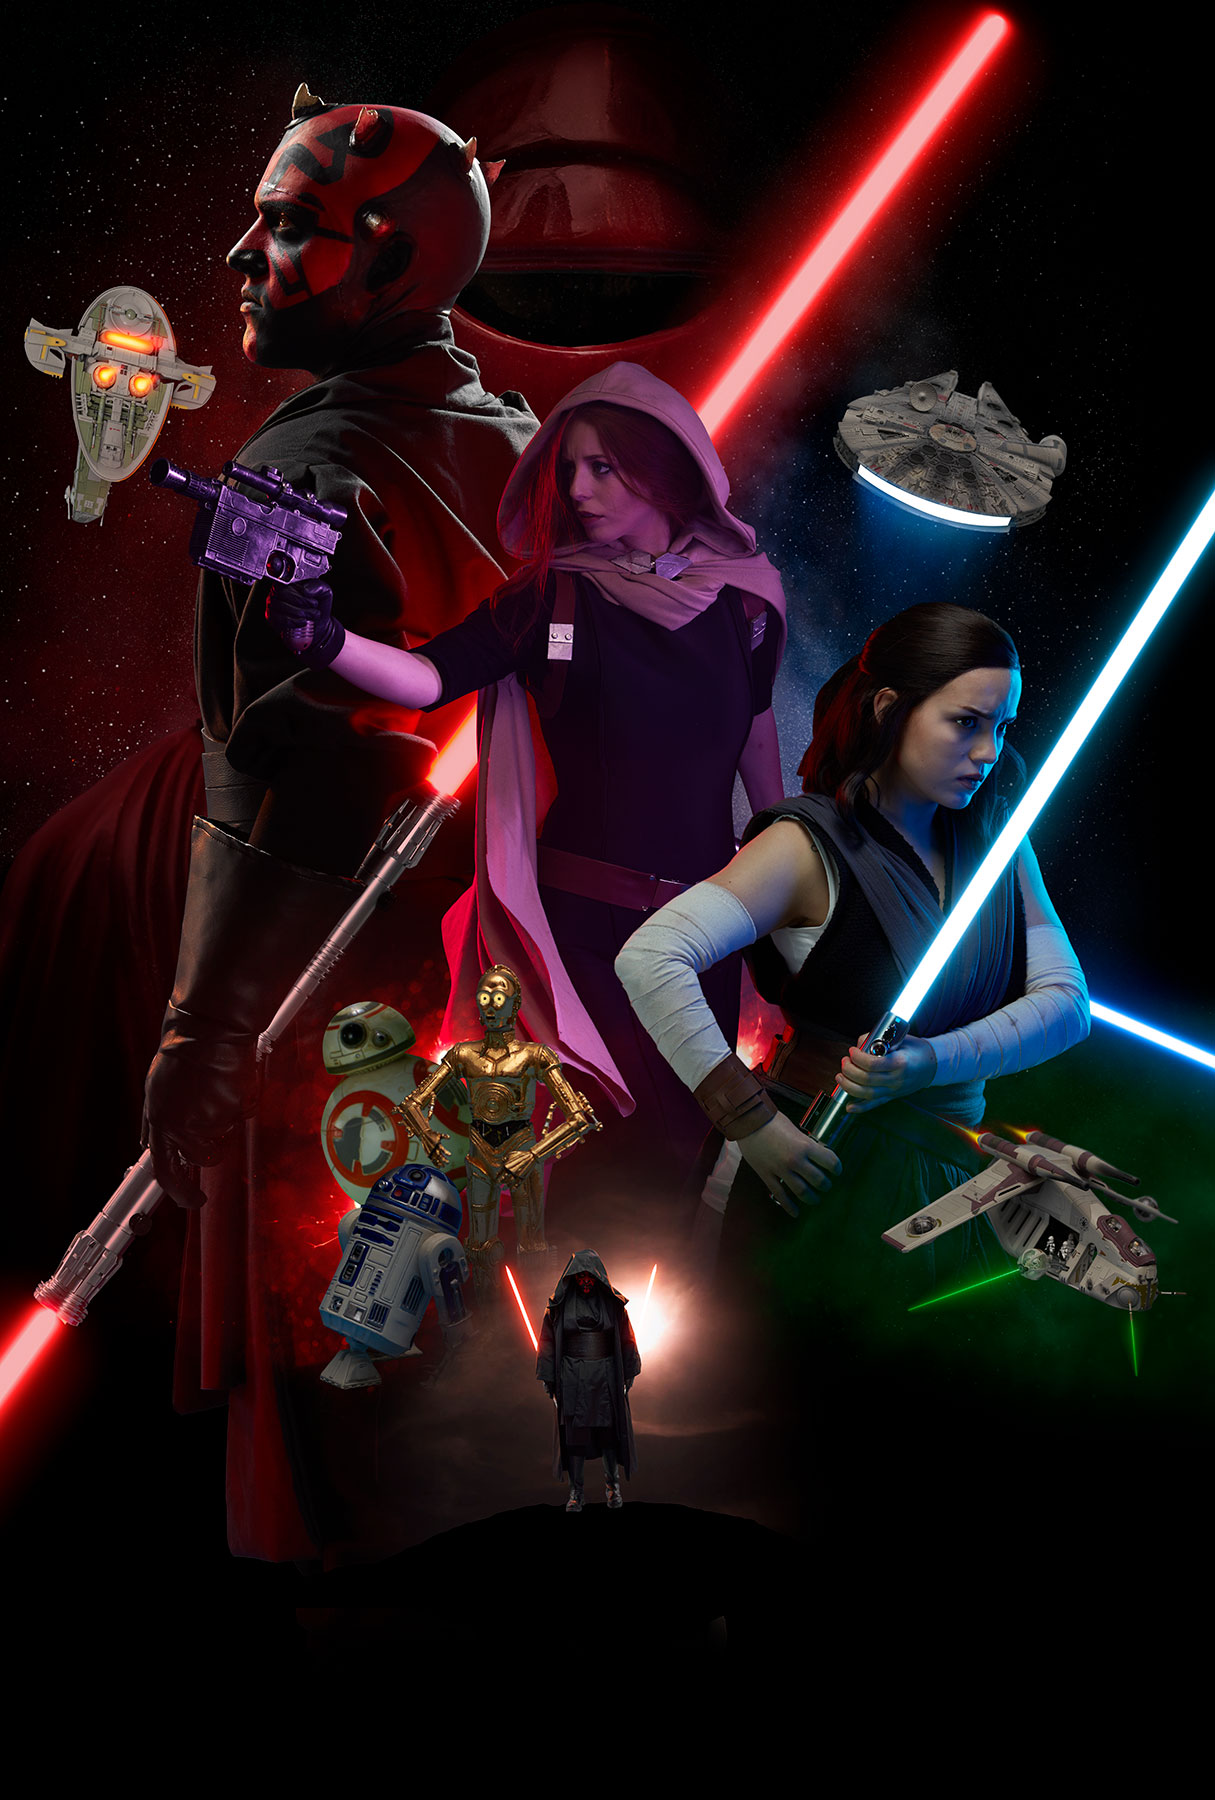 Sayanoff Arthur Star Wars Poster 02 04